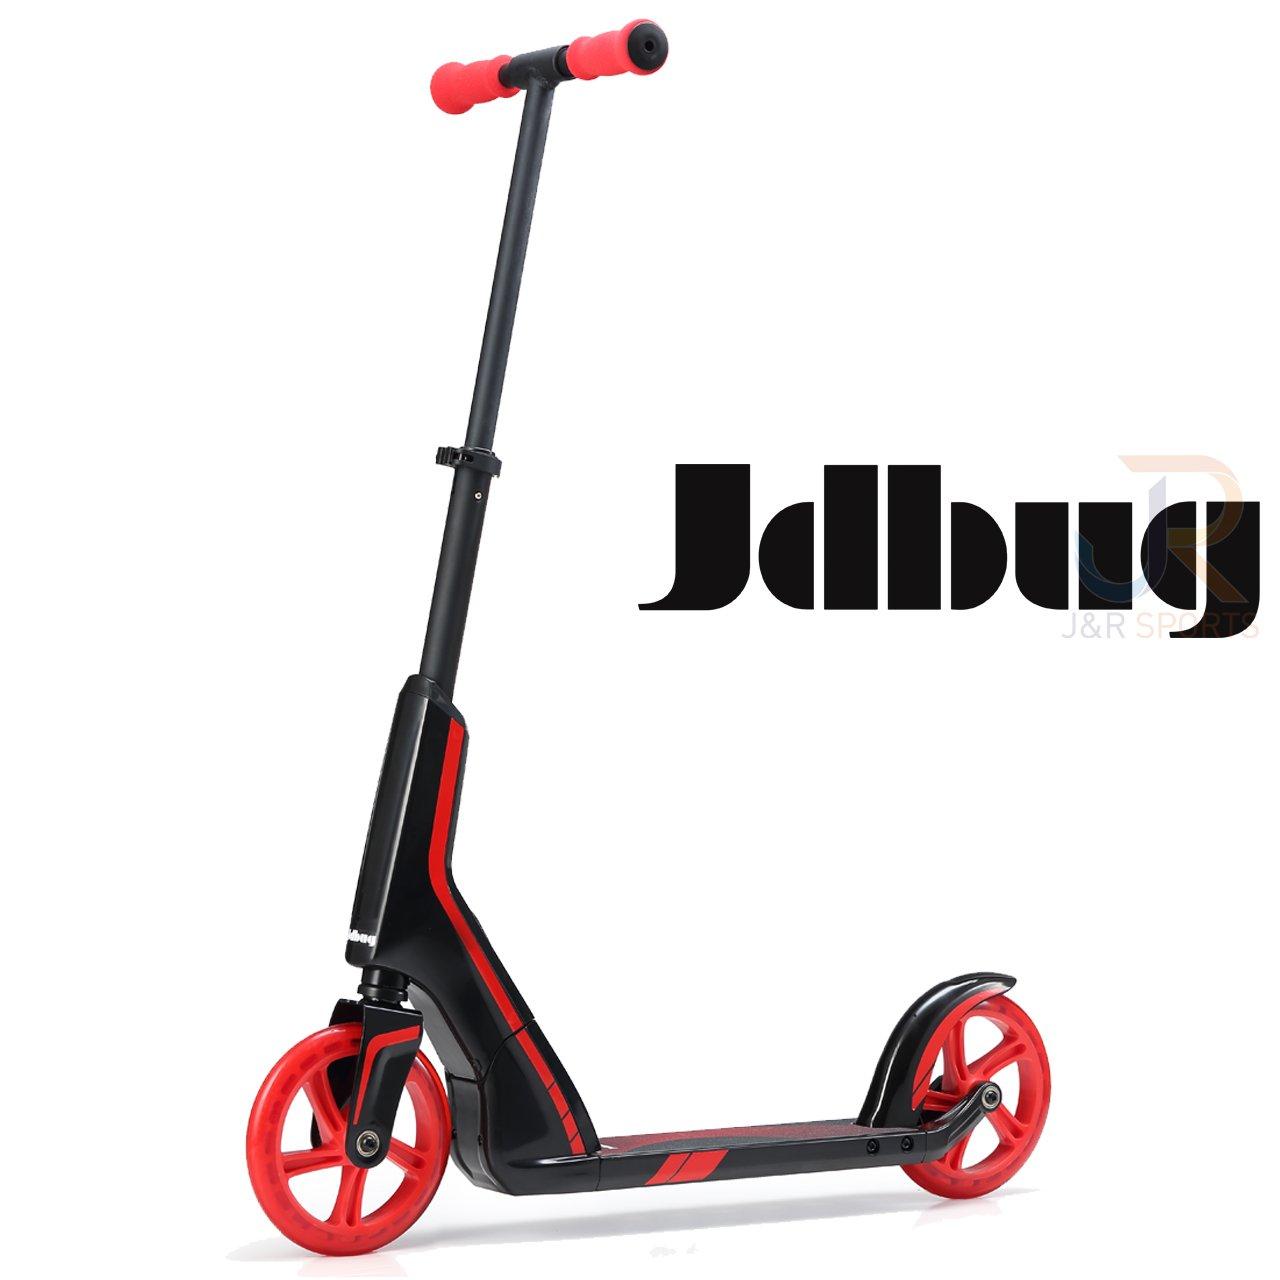 JDバグプロ通勤スクーター - ブラック/レッド